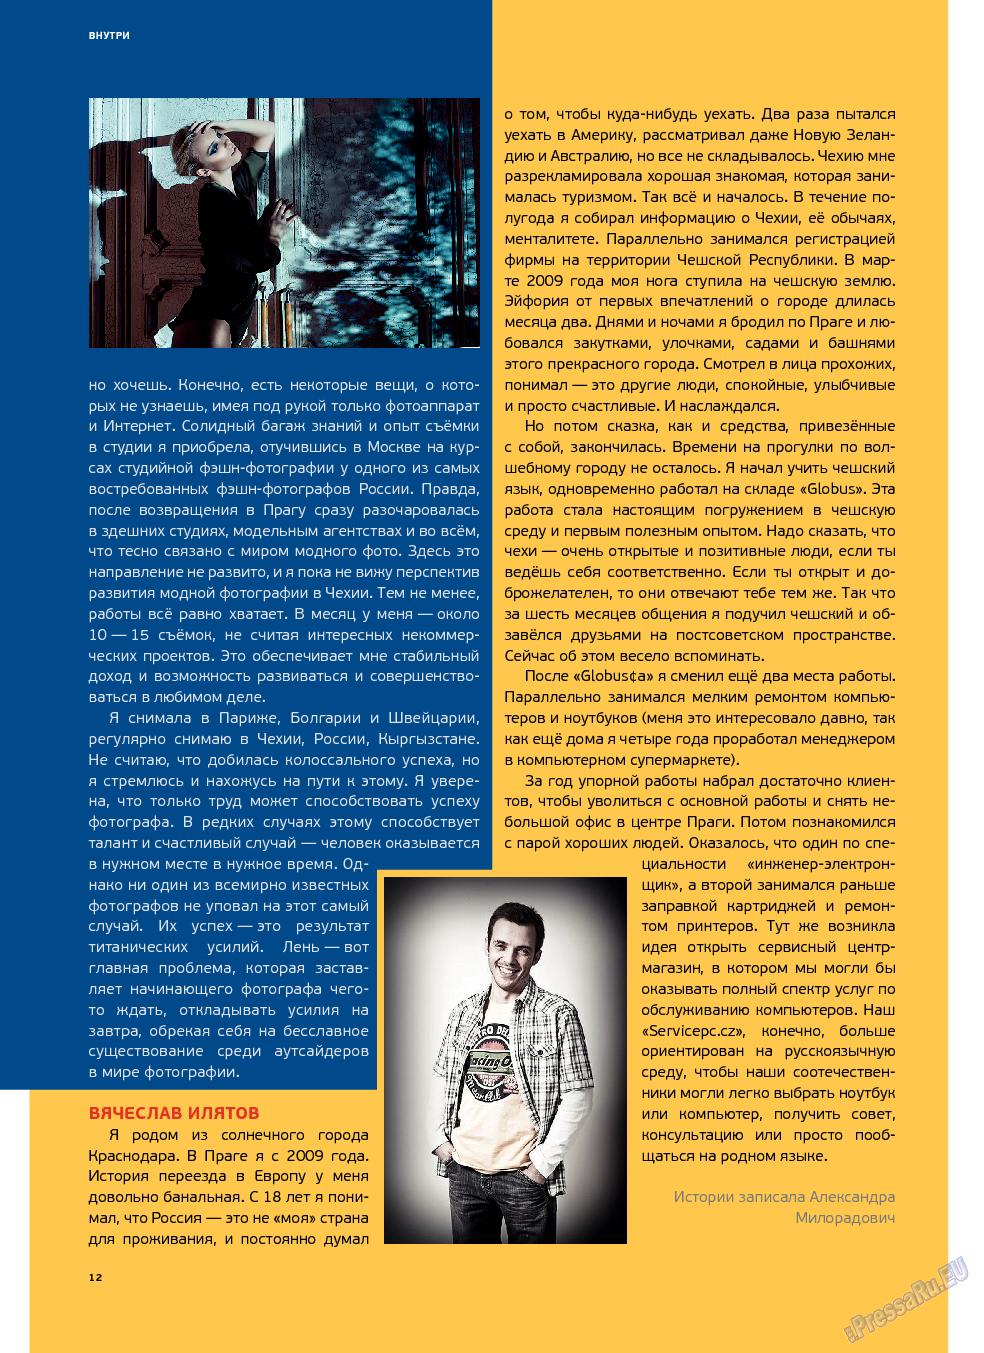 Артек (журнал). 2013 год, номер 2, стр. 14